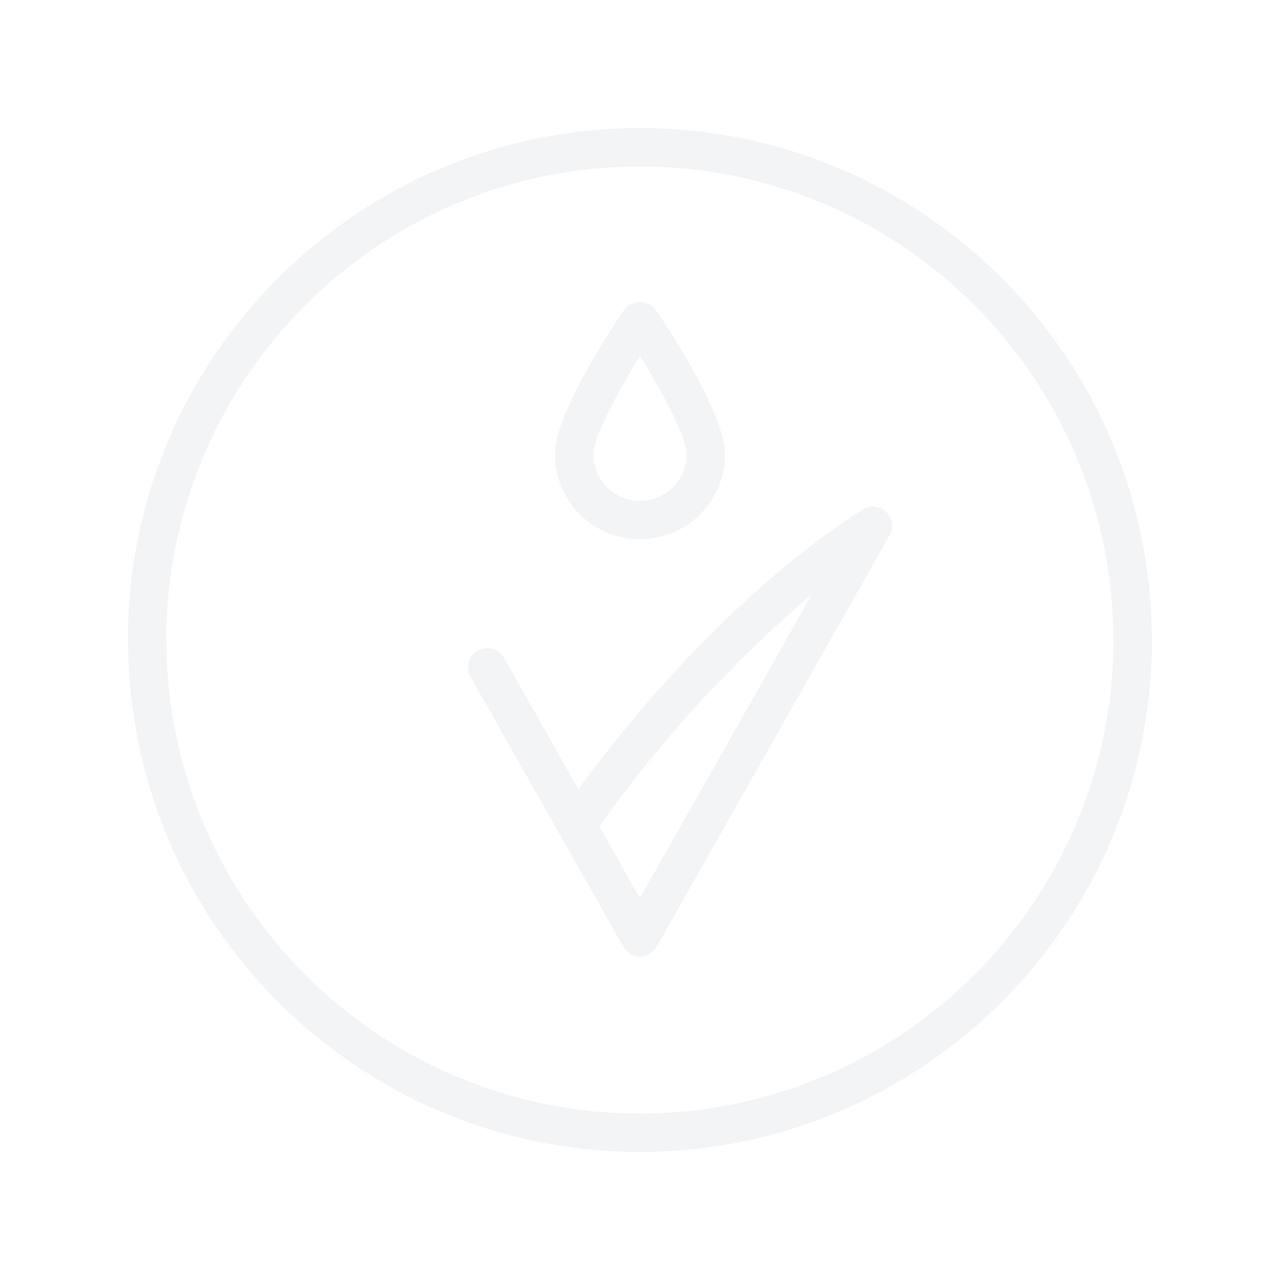 SENSAI Luminous Sheer Foundation SPF15 30ml